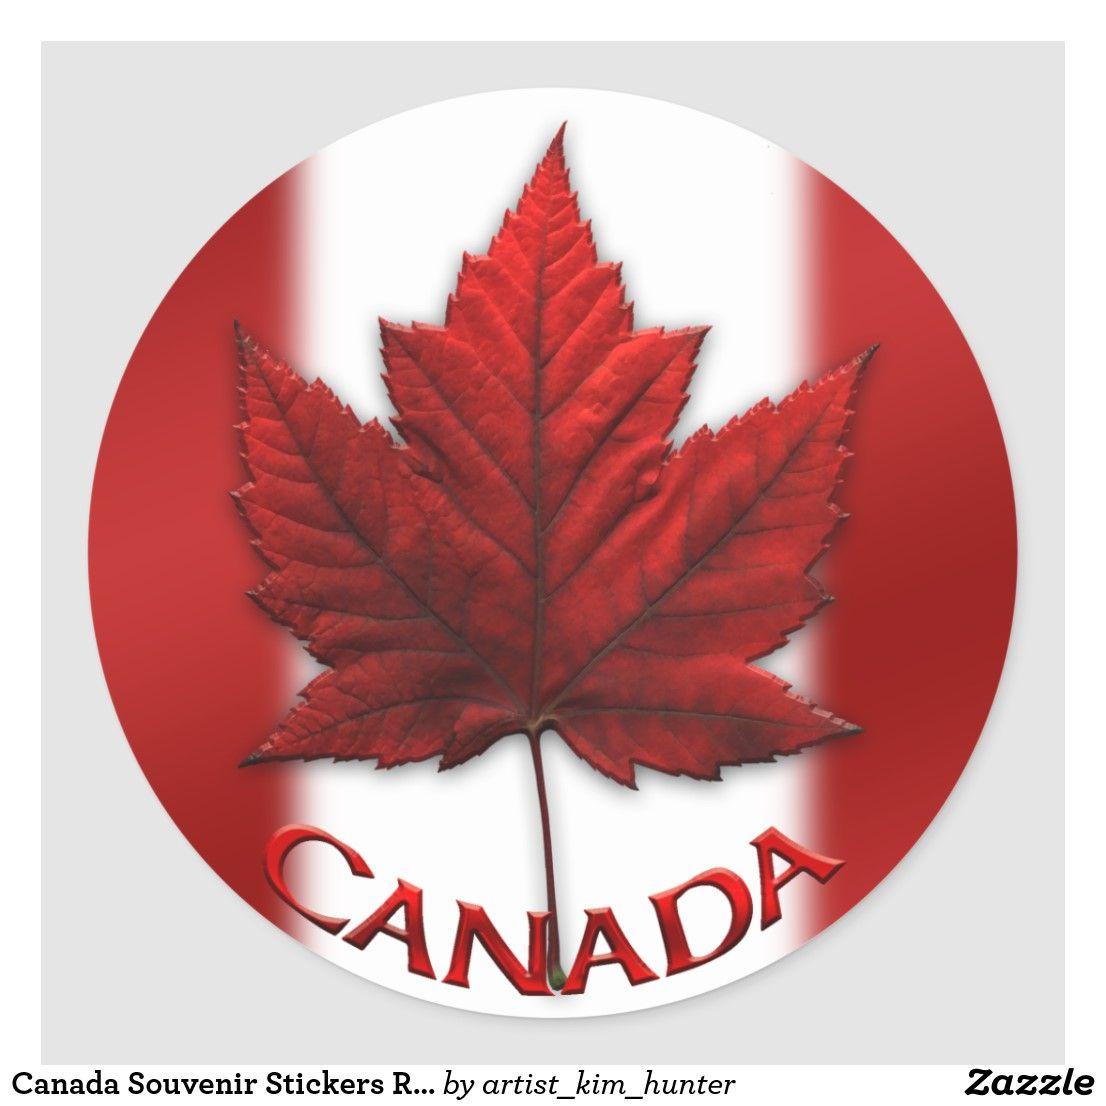 Canada Souvenir Stickers Red Maple Leaf Stickers Zazzle Com In 2020 Maple Leaf Tattoos Canada Flag Canadian Artists